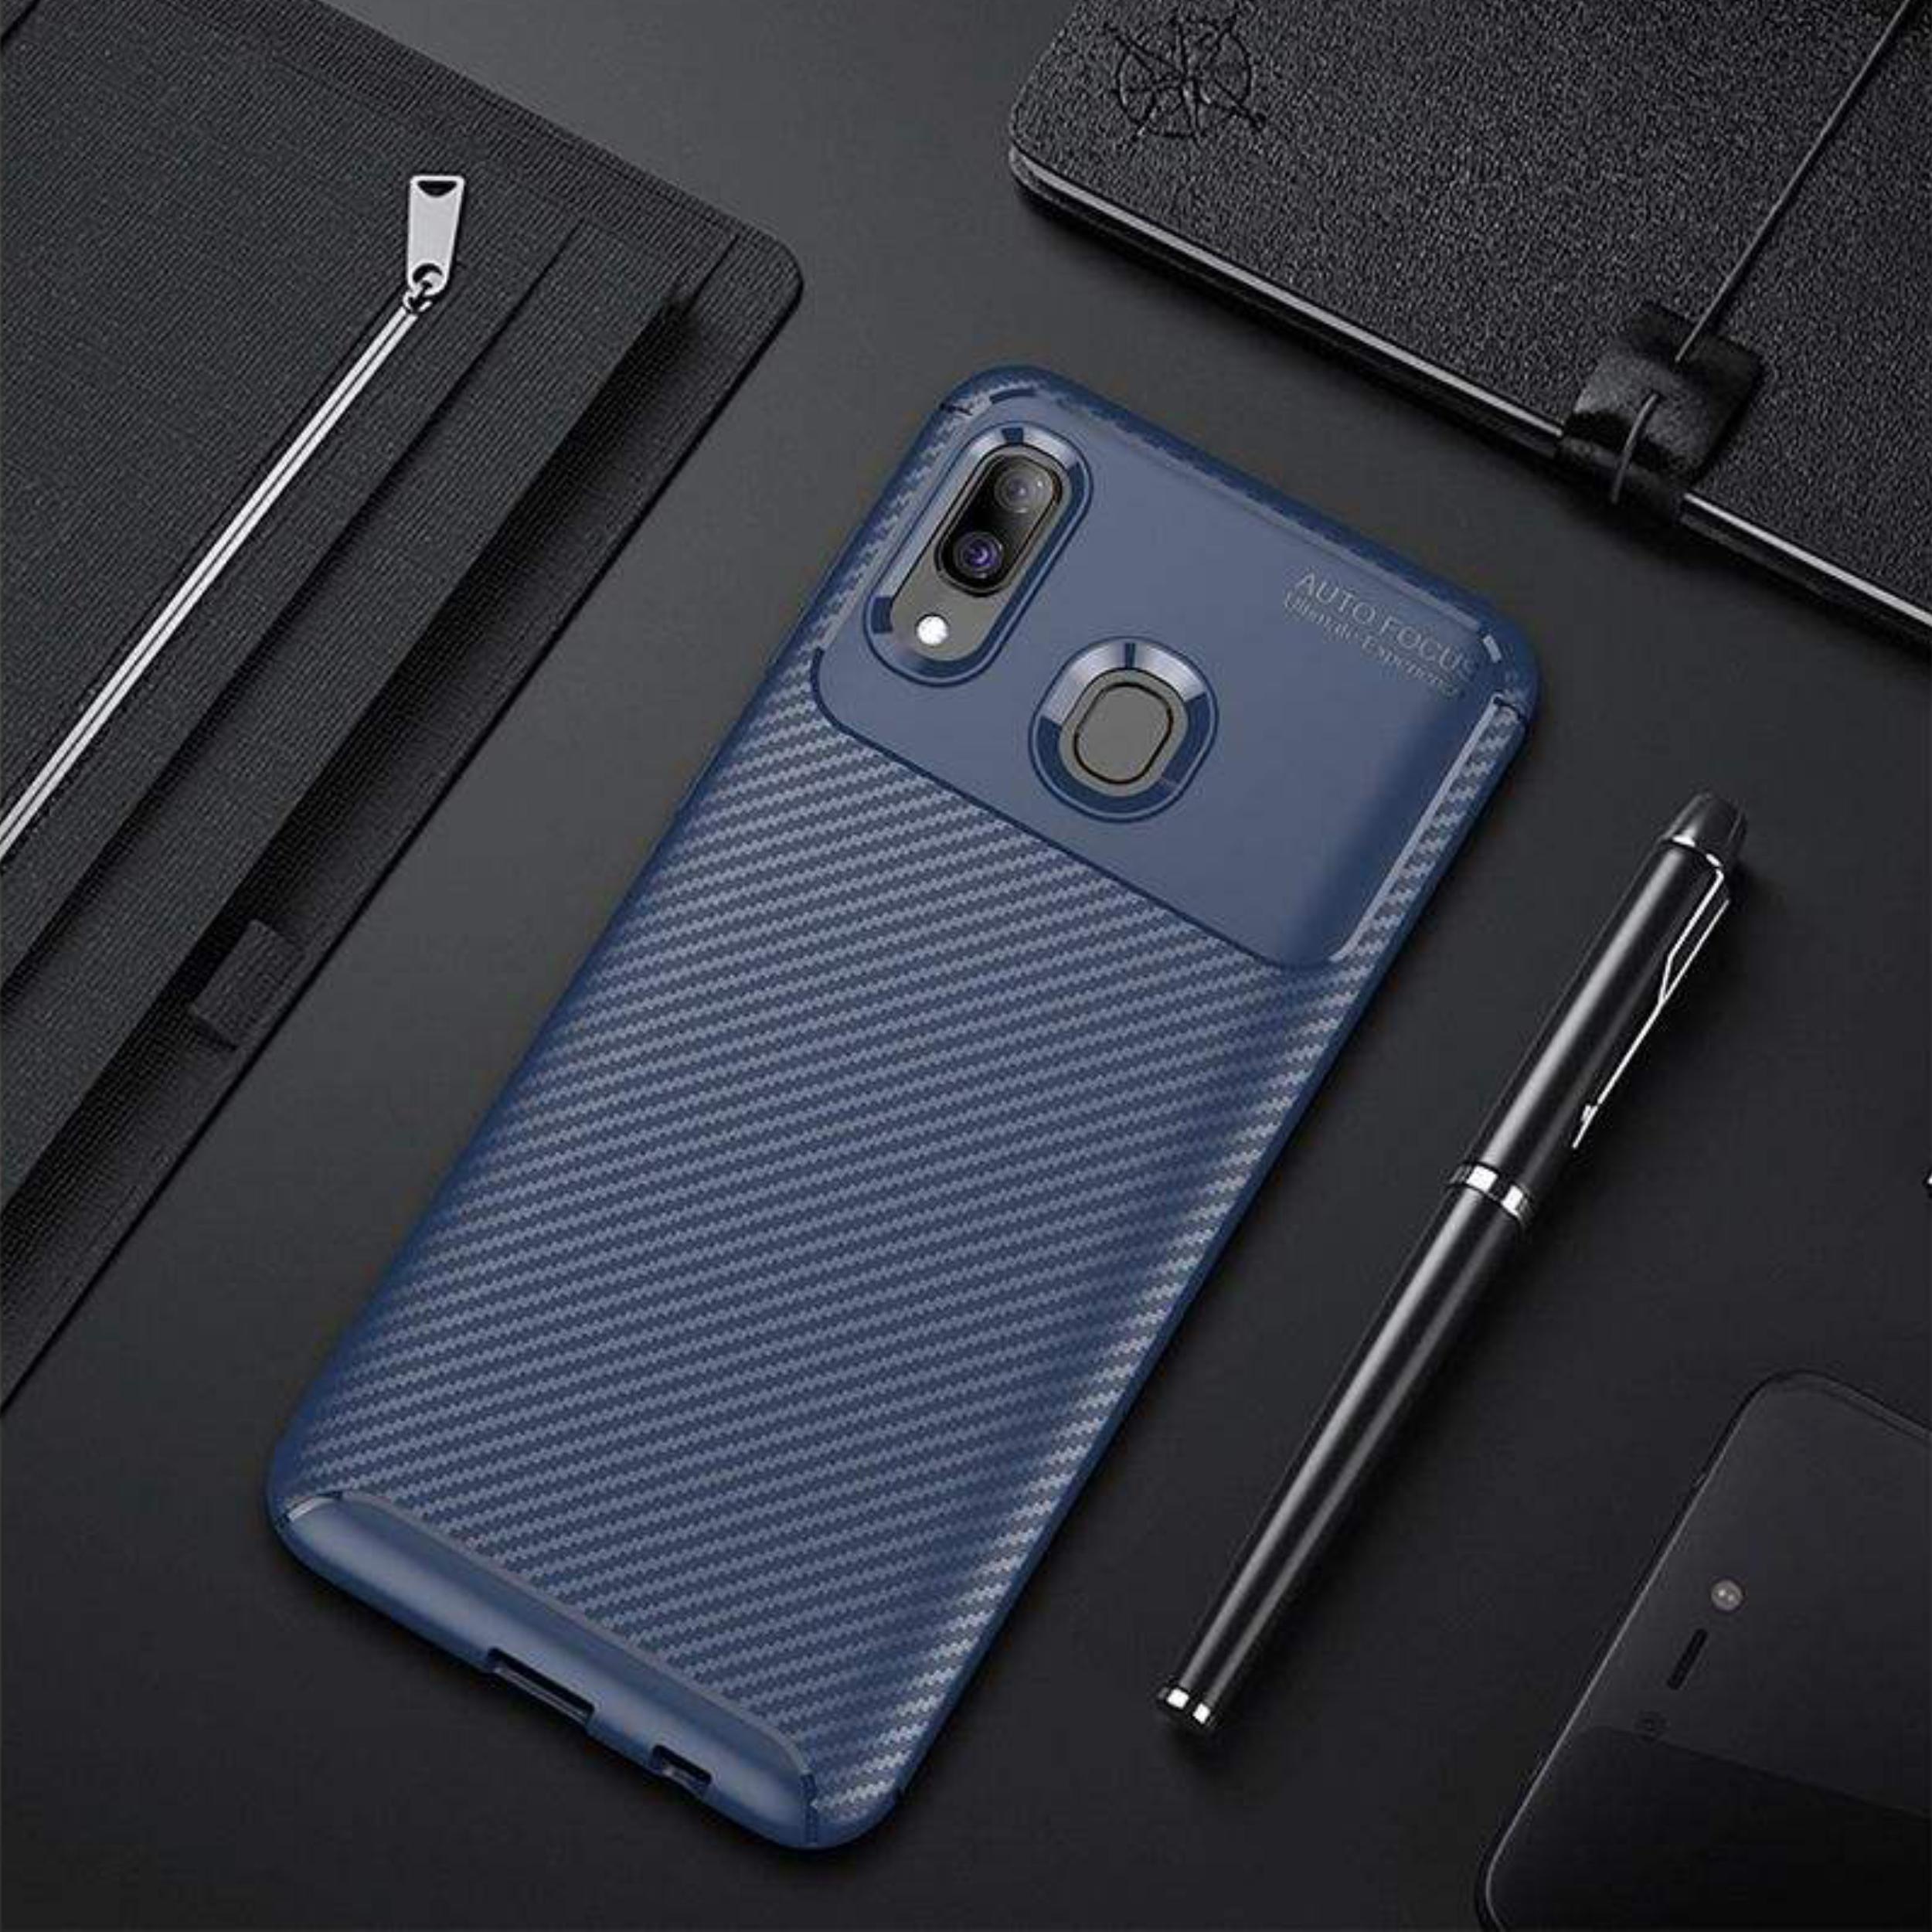 کاور لاین کینگ مدل A21 مناسب برای گوشی موبایل سامسونگ Galaxy A20/ A30/M10s thumb 2 12